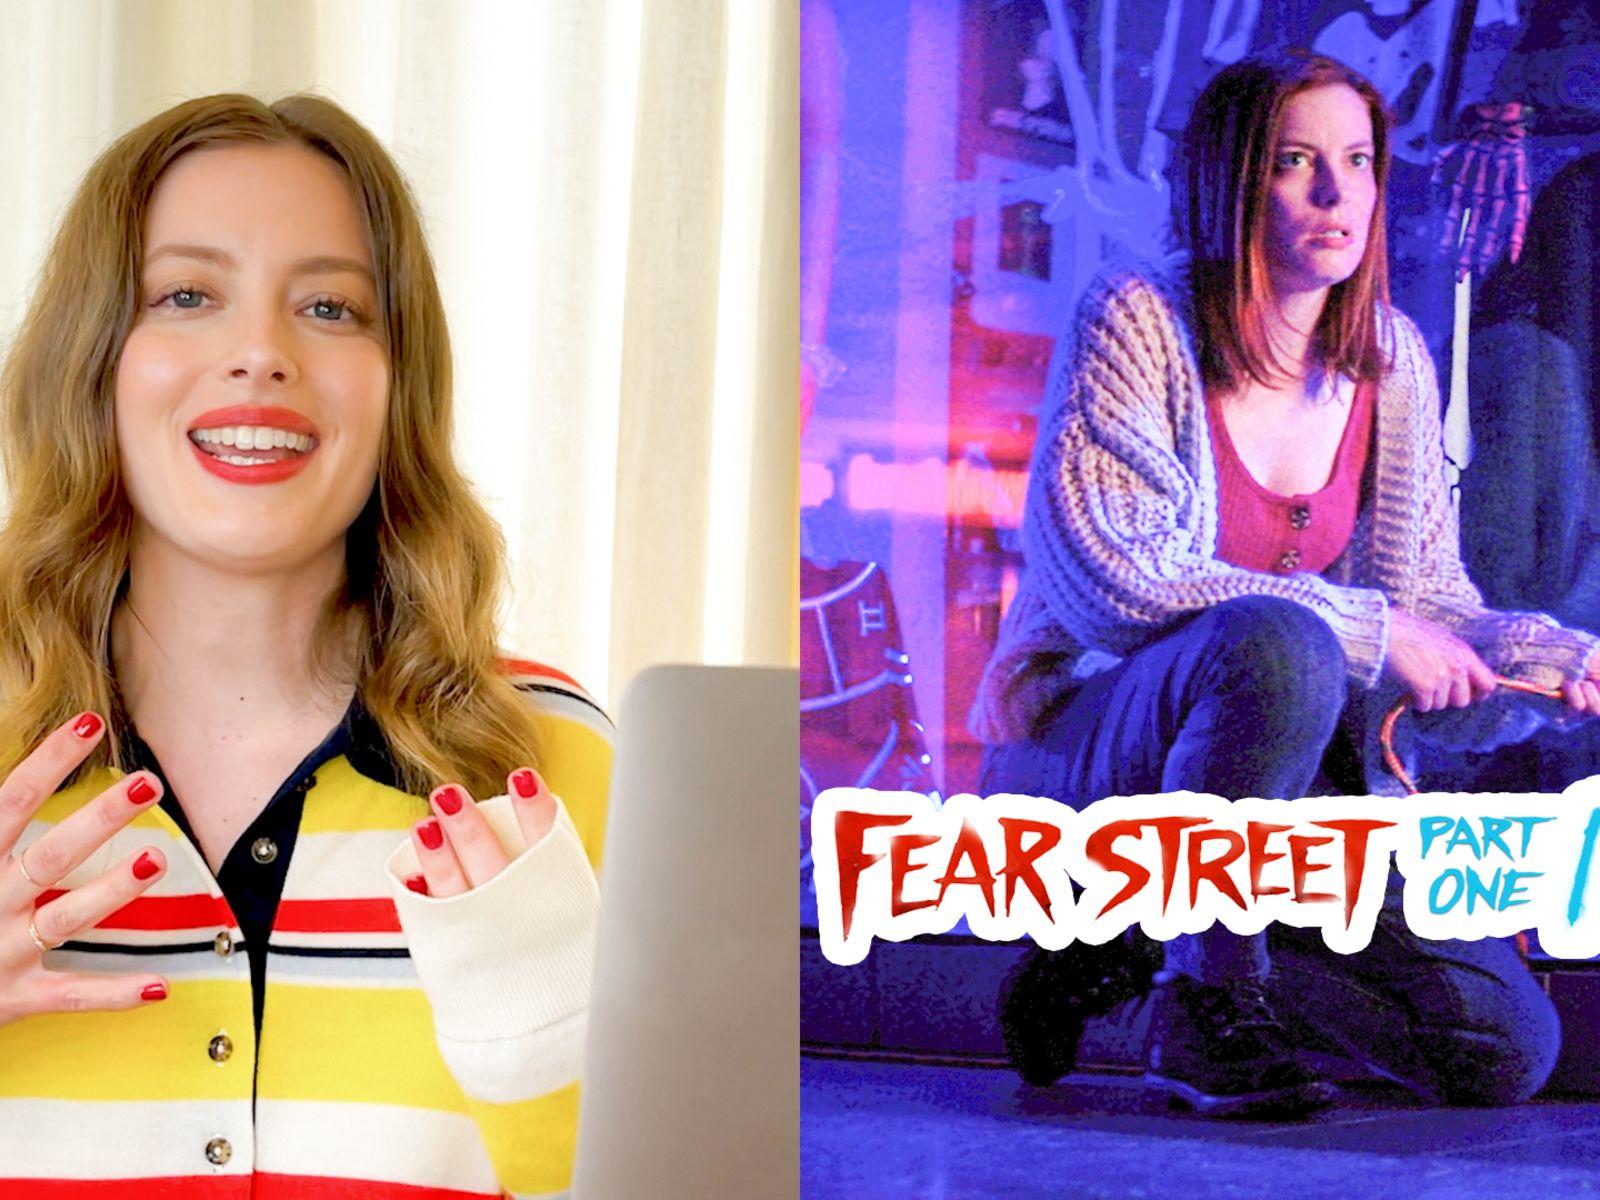 Gillian Jacobs Breaks Down Her Best Looks, from 'Community' to 'Fear Street Part One'